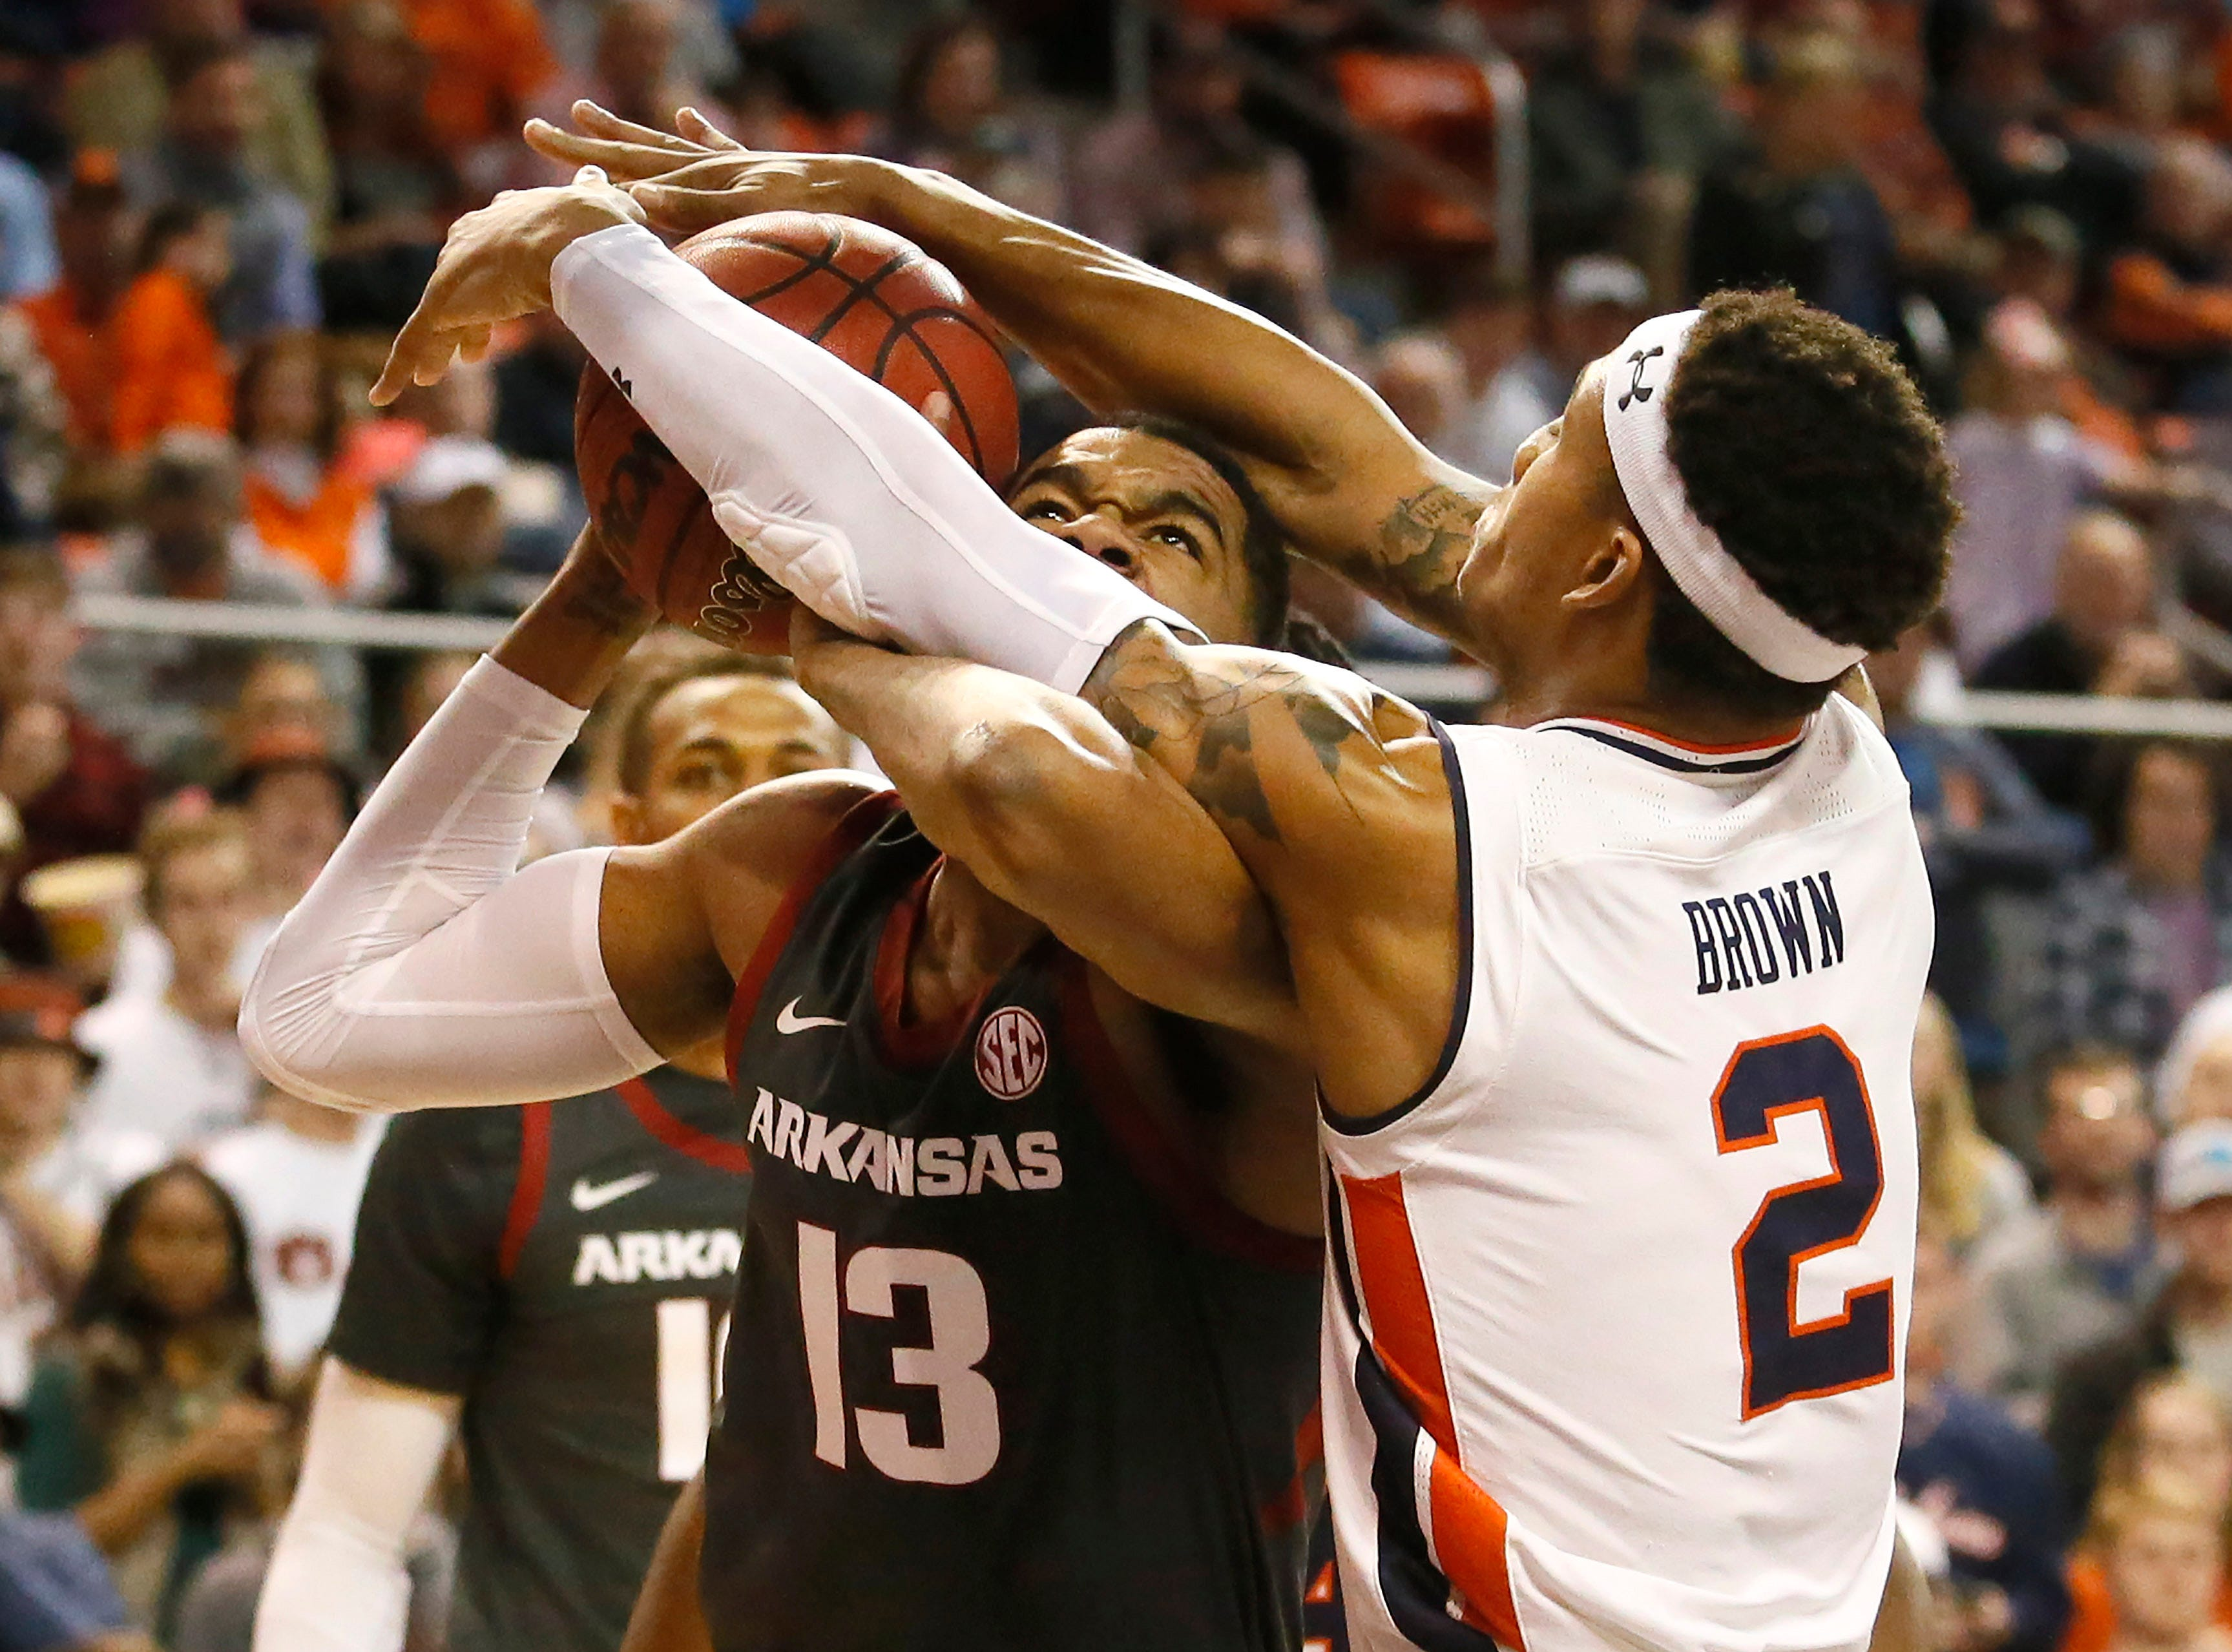 Feb 20, 2019; Auburn, AL, USA; Auburn Tigers guard Bryce Brown (2) fouls Arkansas Razorbacks guard Mason Jones (13) during the first half at Auburn Arena. Mandatory Credit: John Reed-USA TODAY Sports